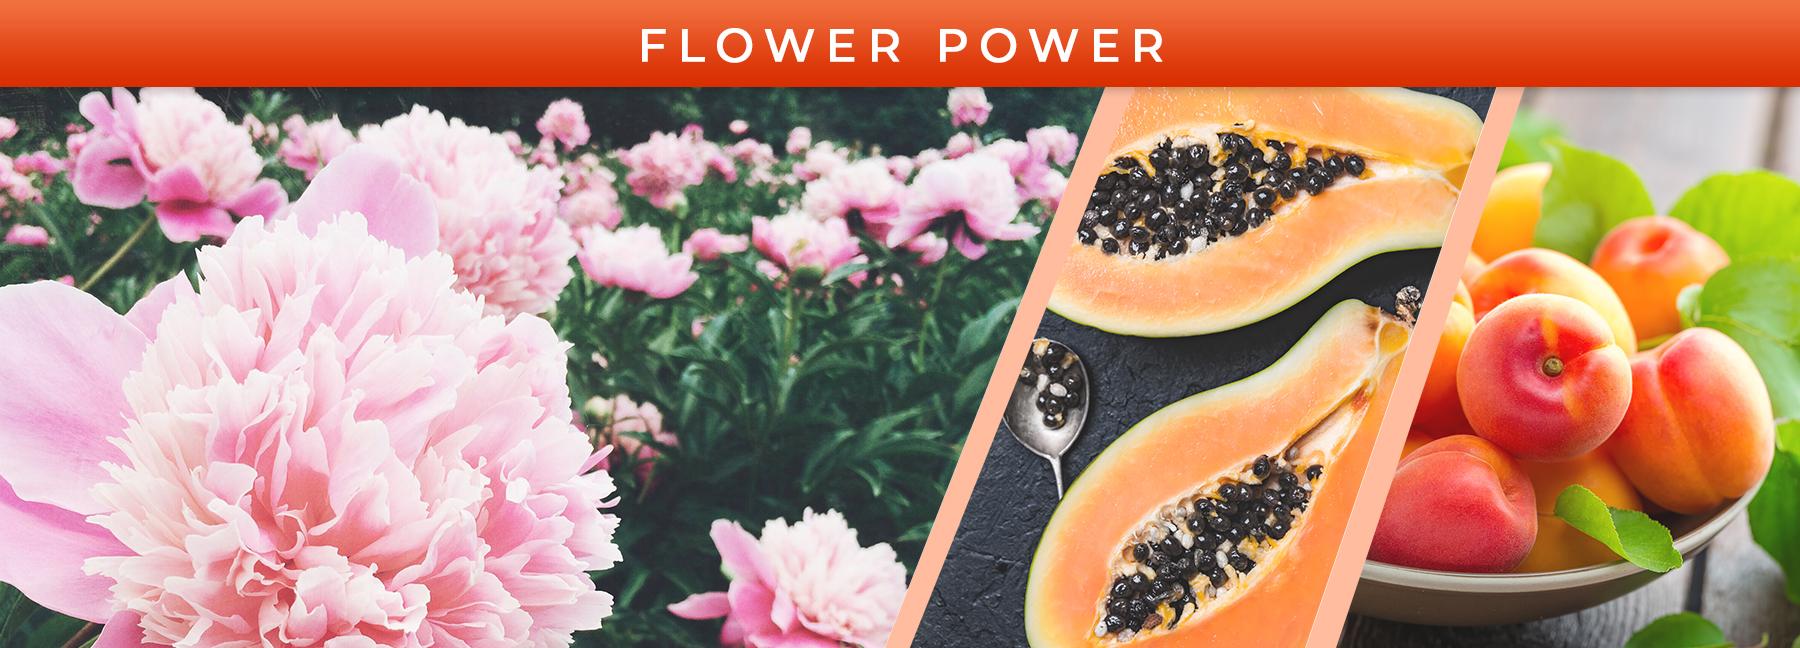 Flower Power fragrance elements